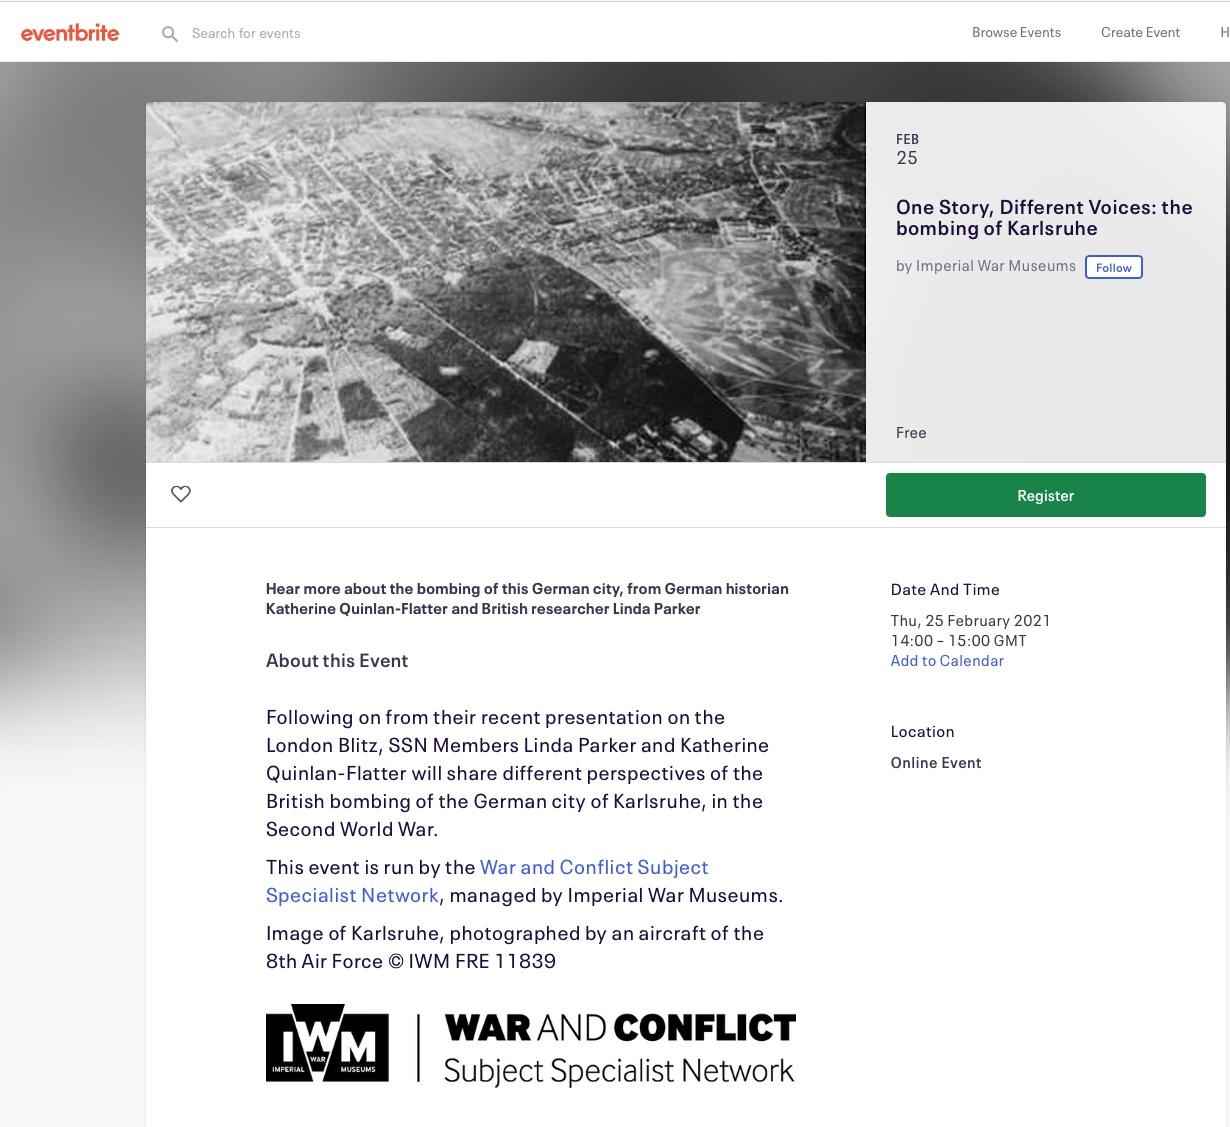 IWM Web presentation The Bombing of Karlsruhe